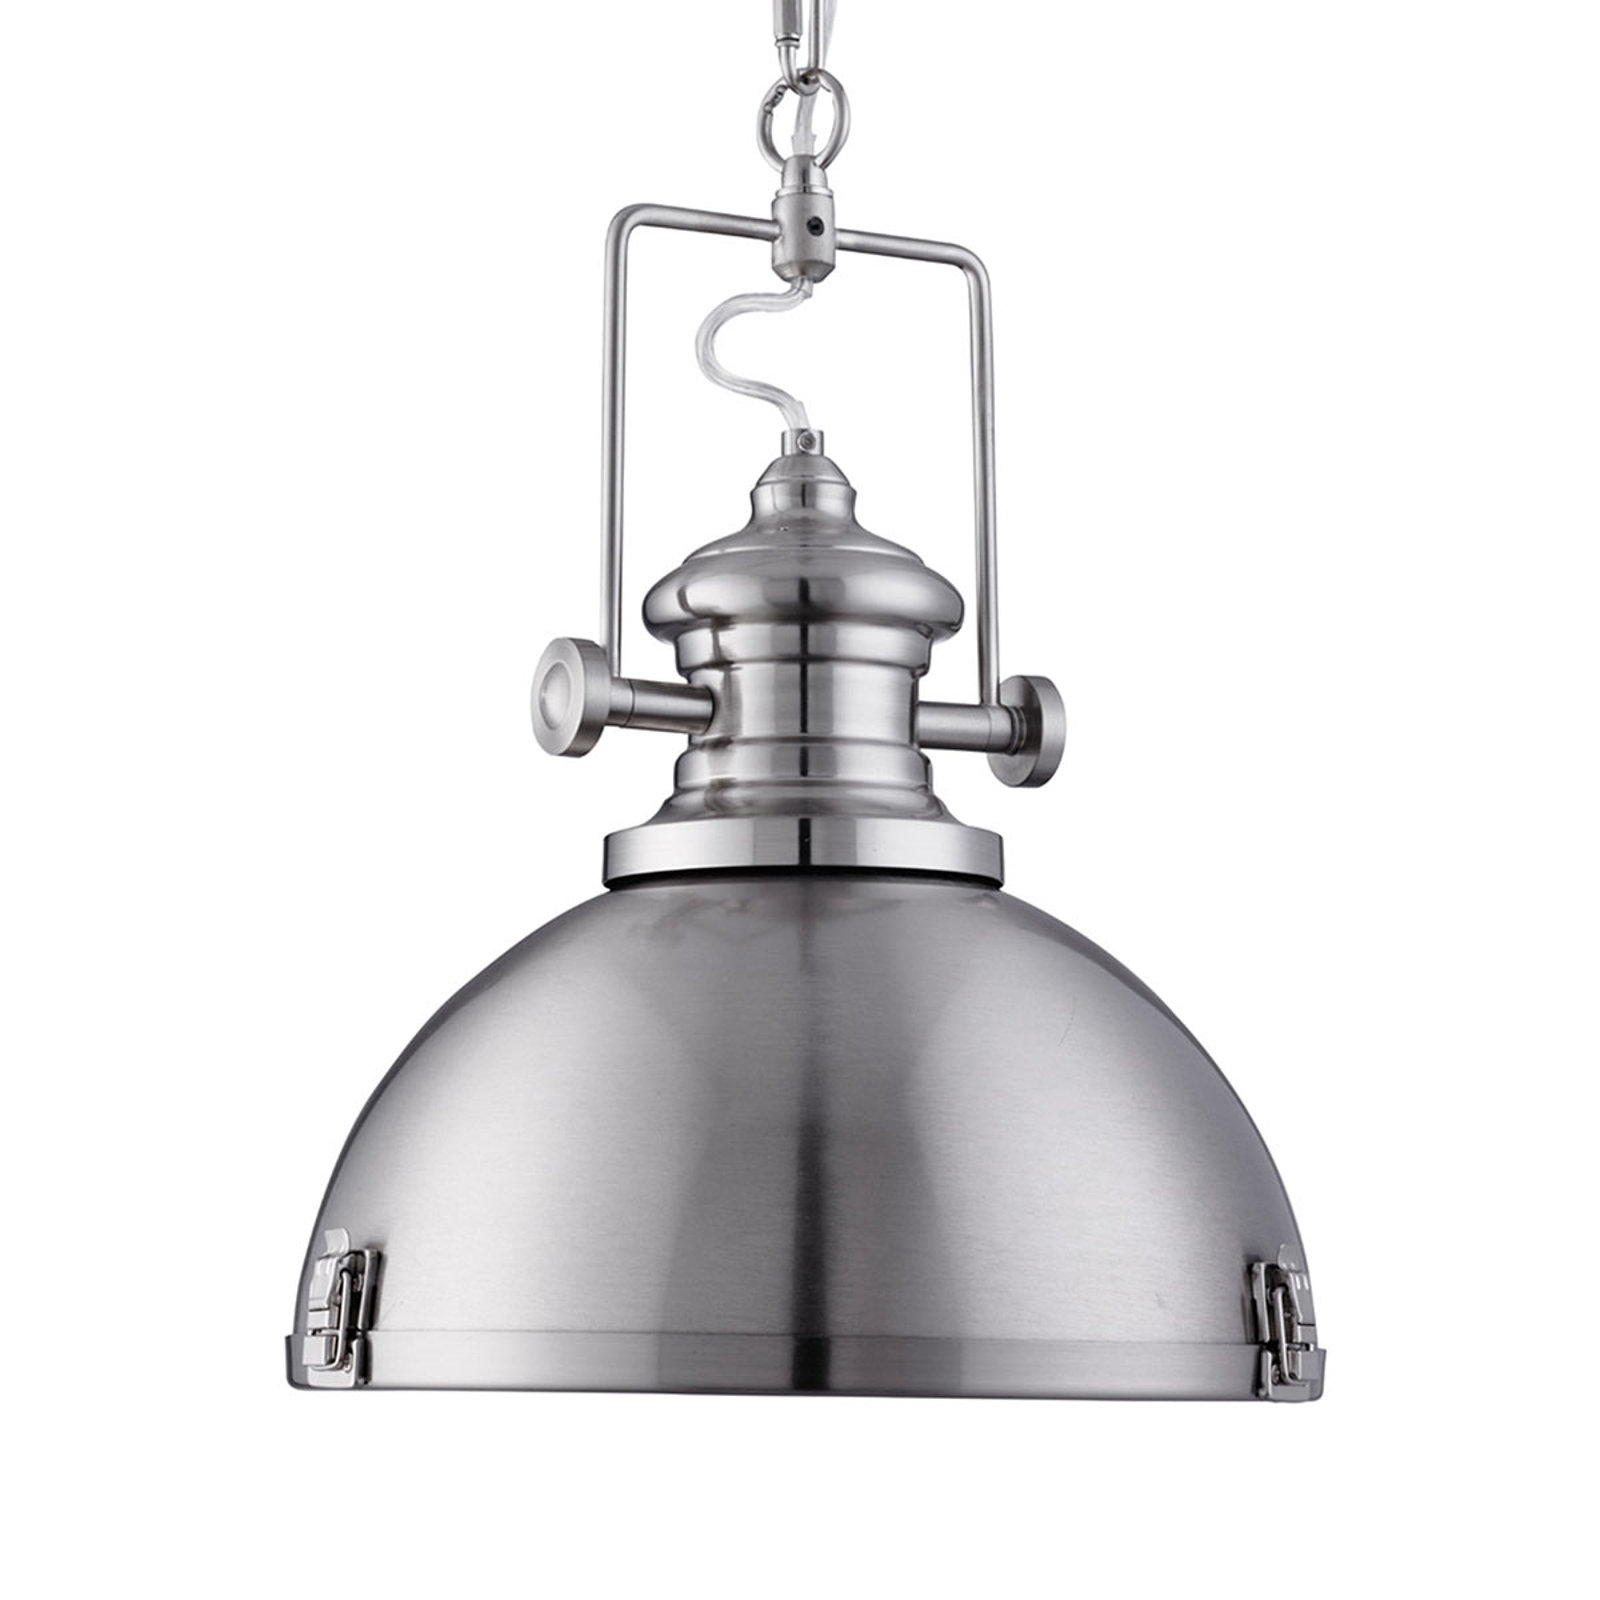 Trendige Industrie-Pendelleuchte Silver